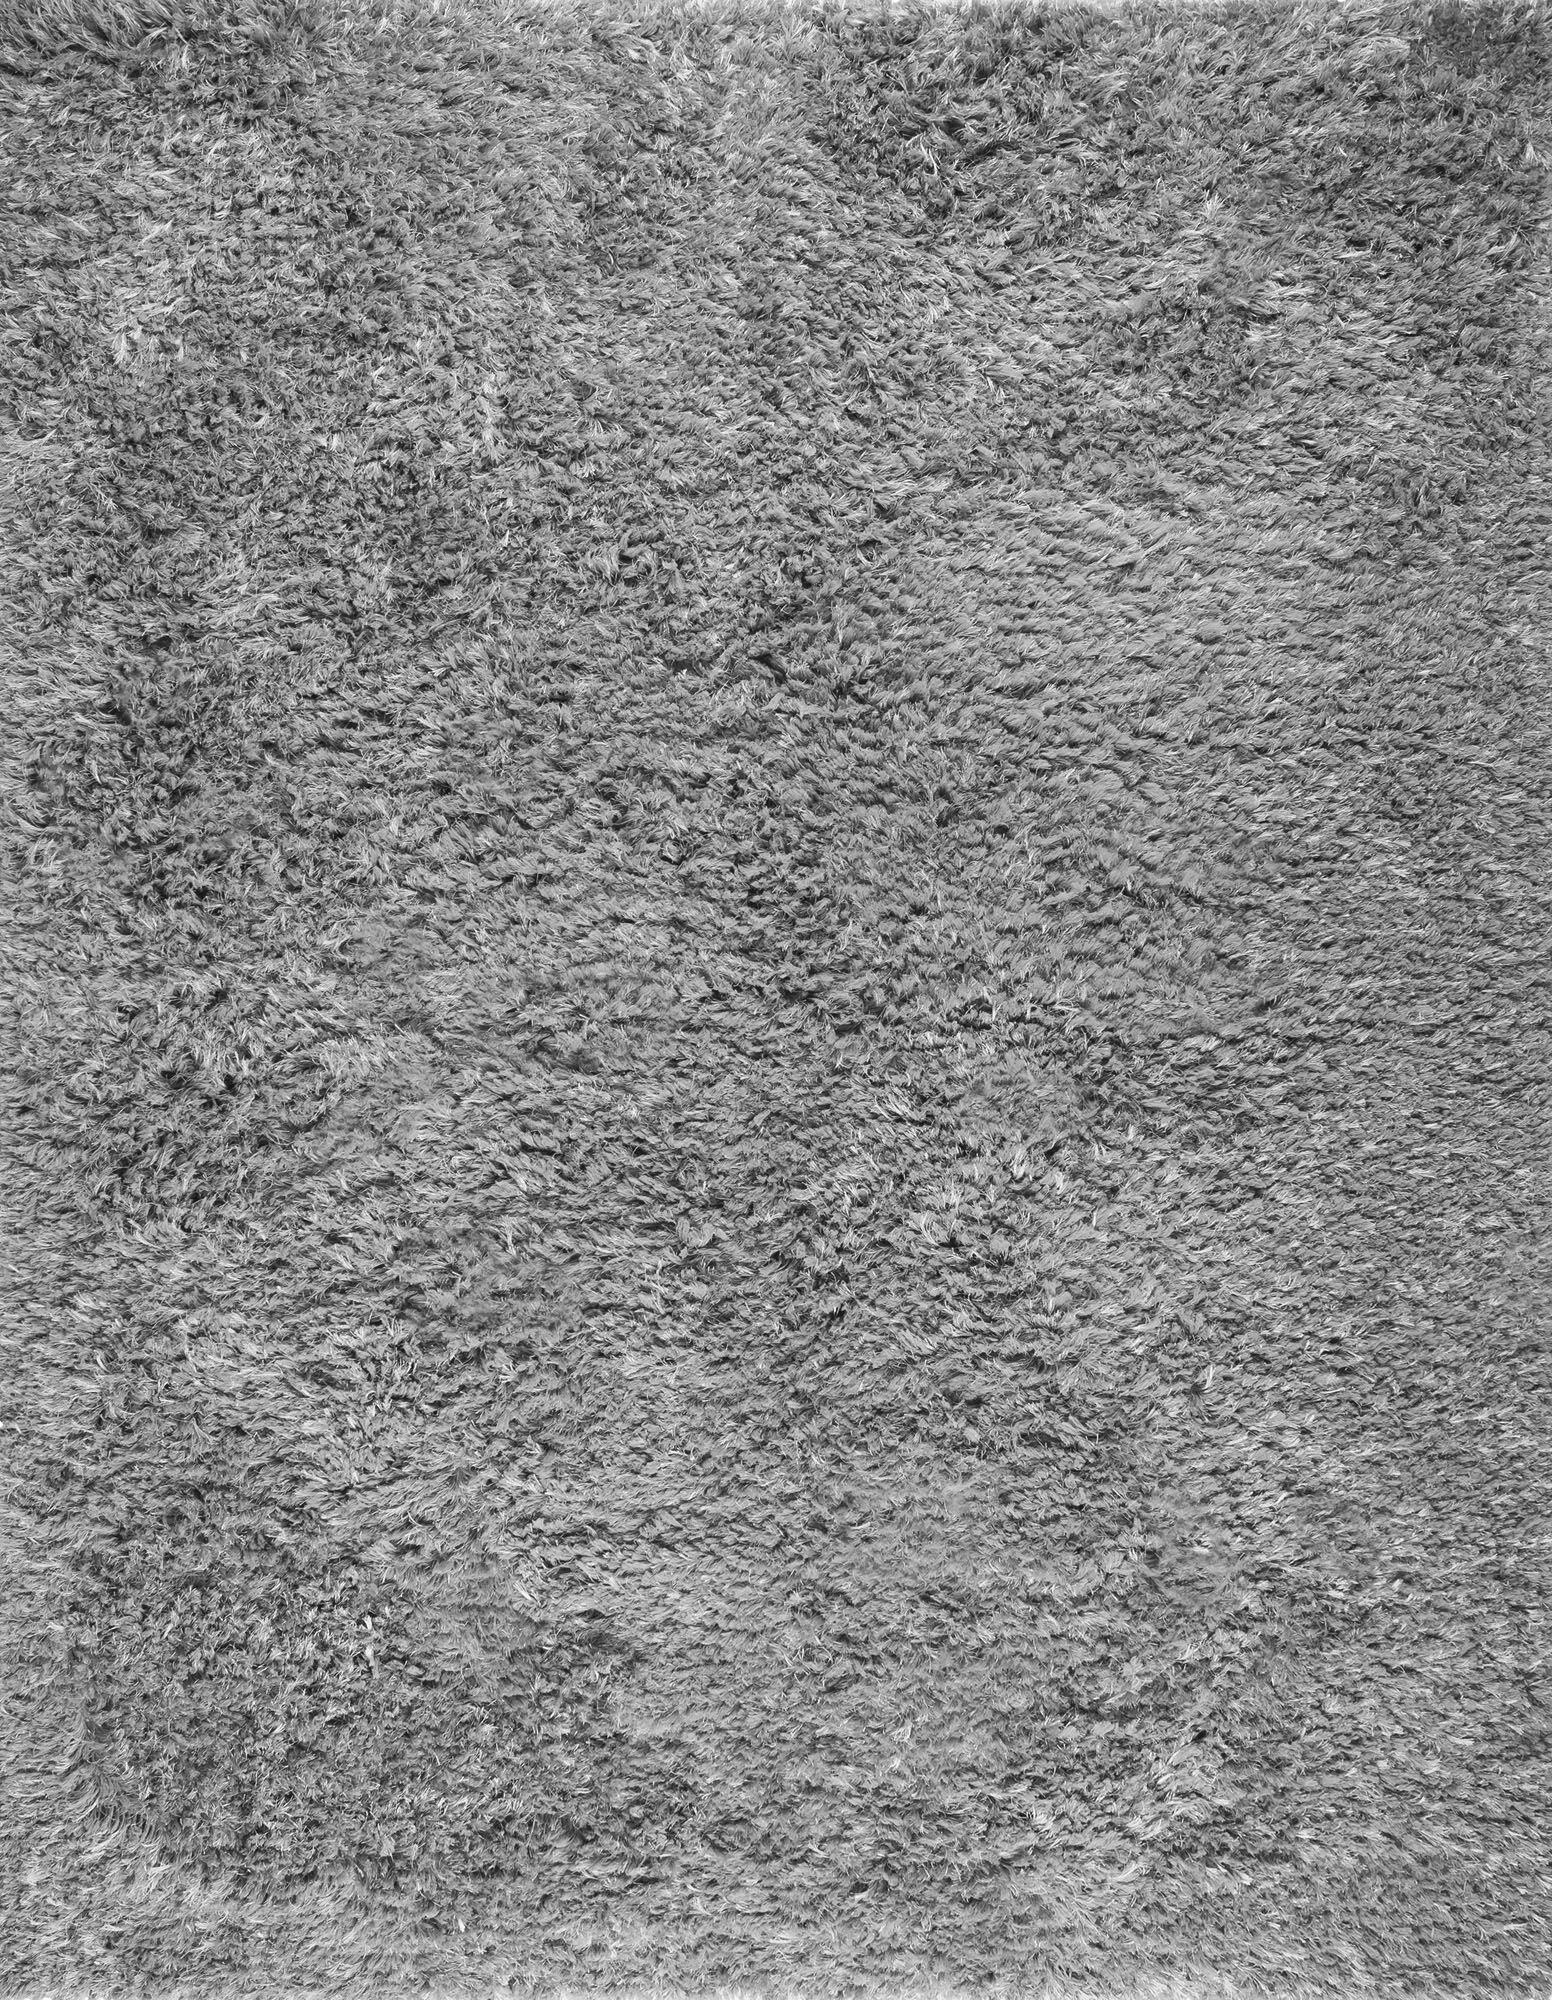 Paris Hand-Woven Silver Area Rug Rug Size: Rectangle 8' x 10'